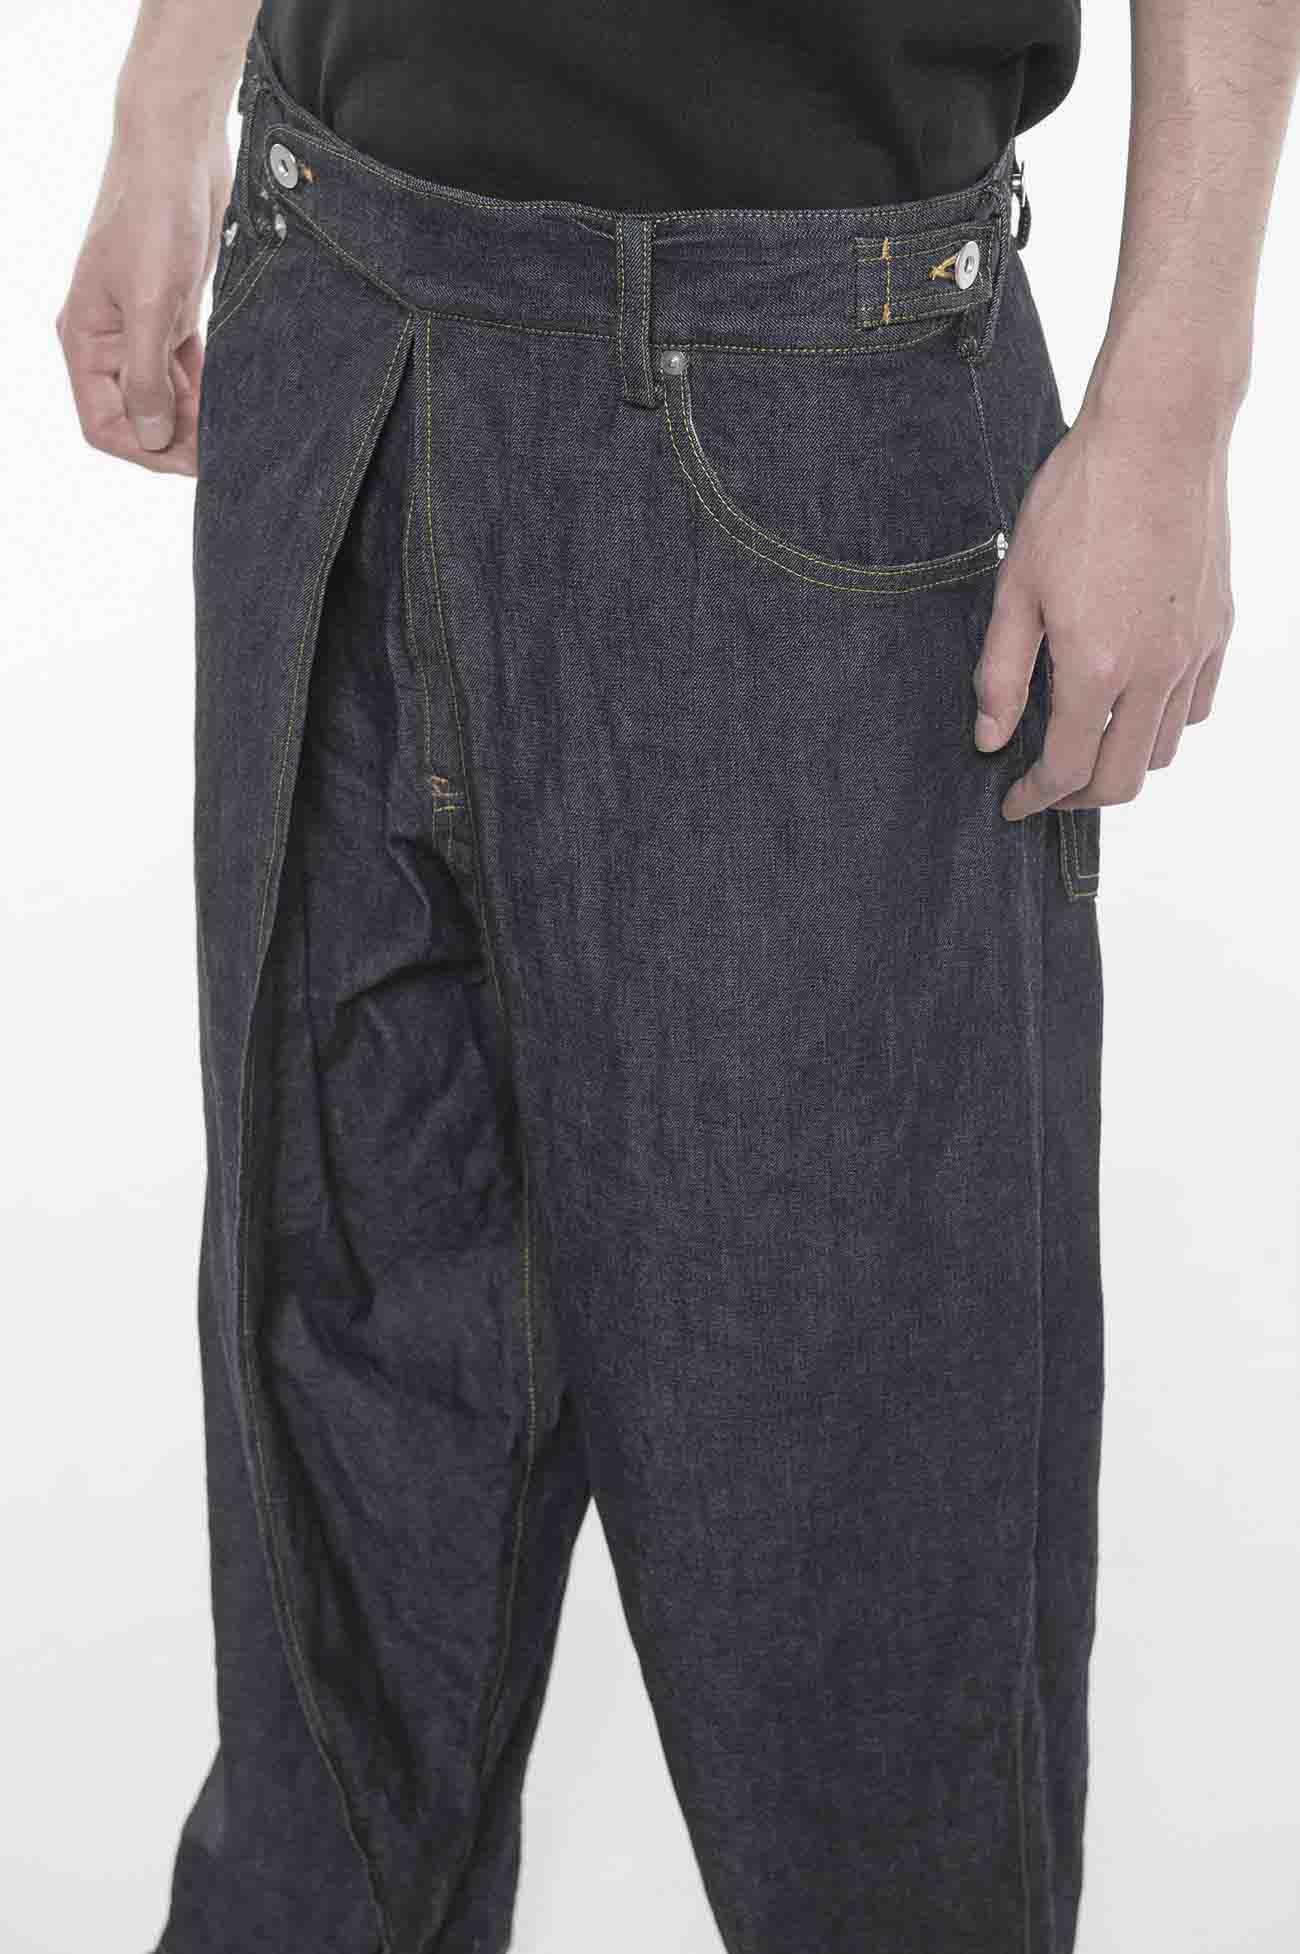 10 oz Denim Center Wide Tuck Pants